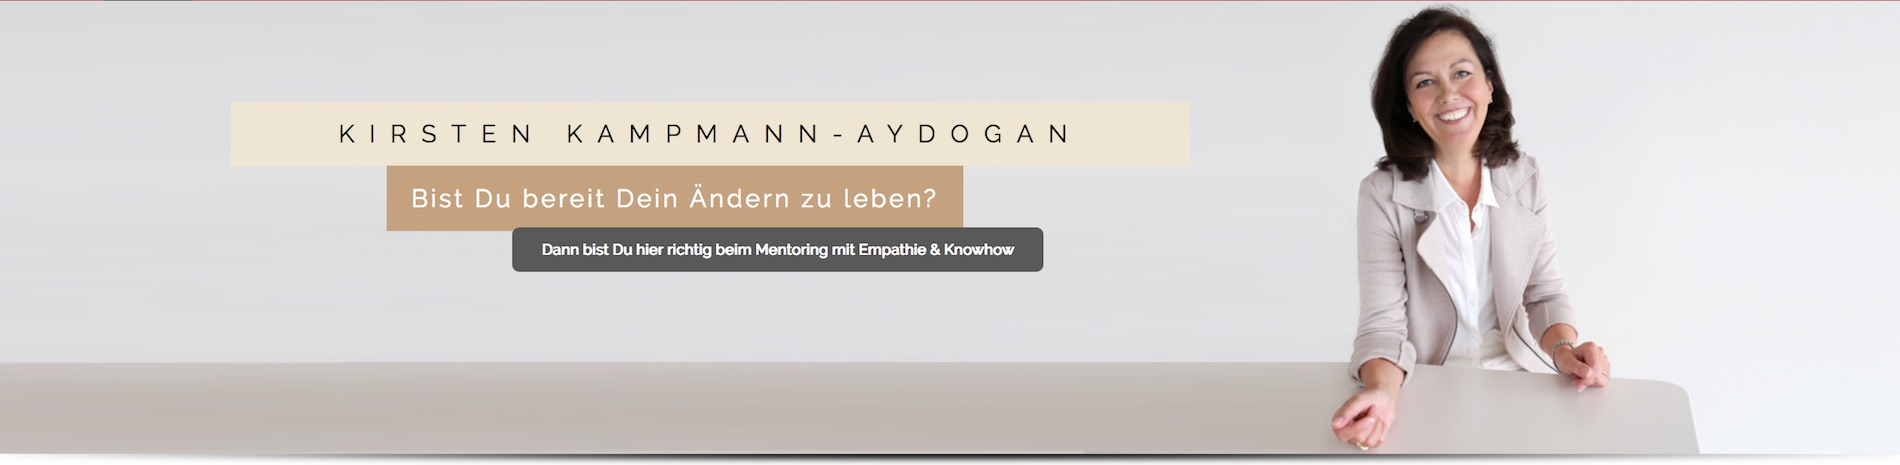 Kirsten Kampmann-Aydogan